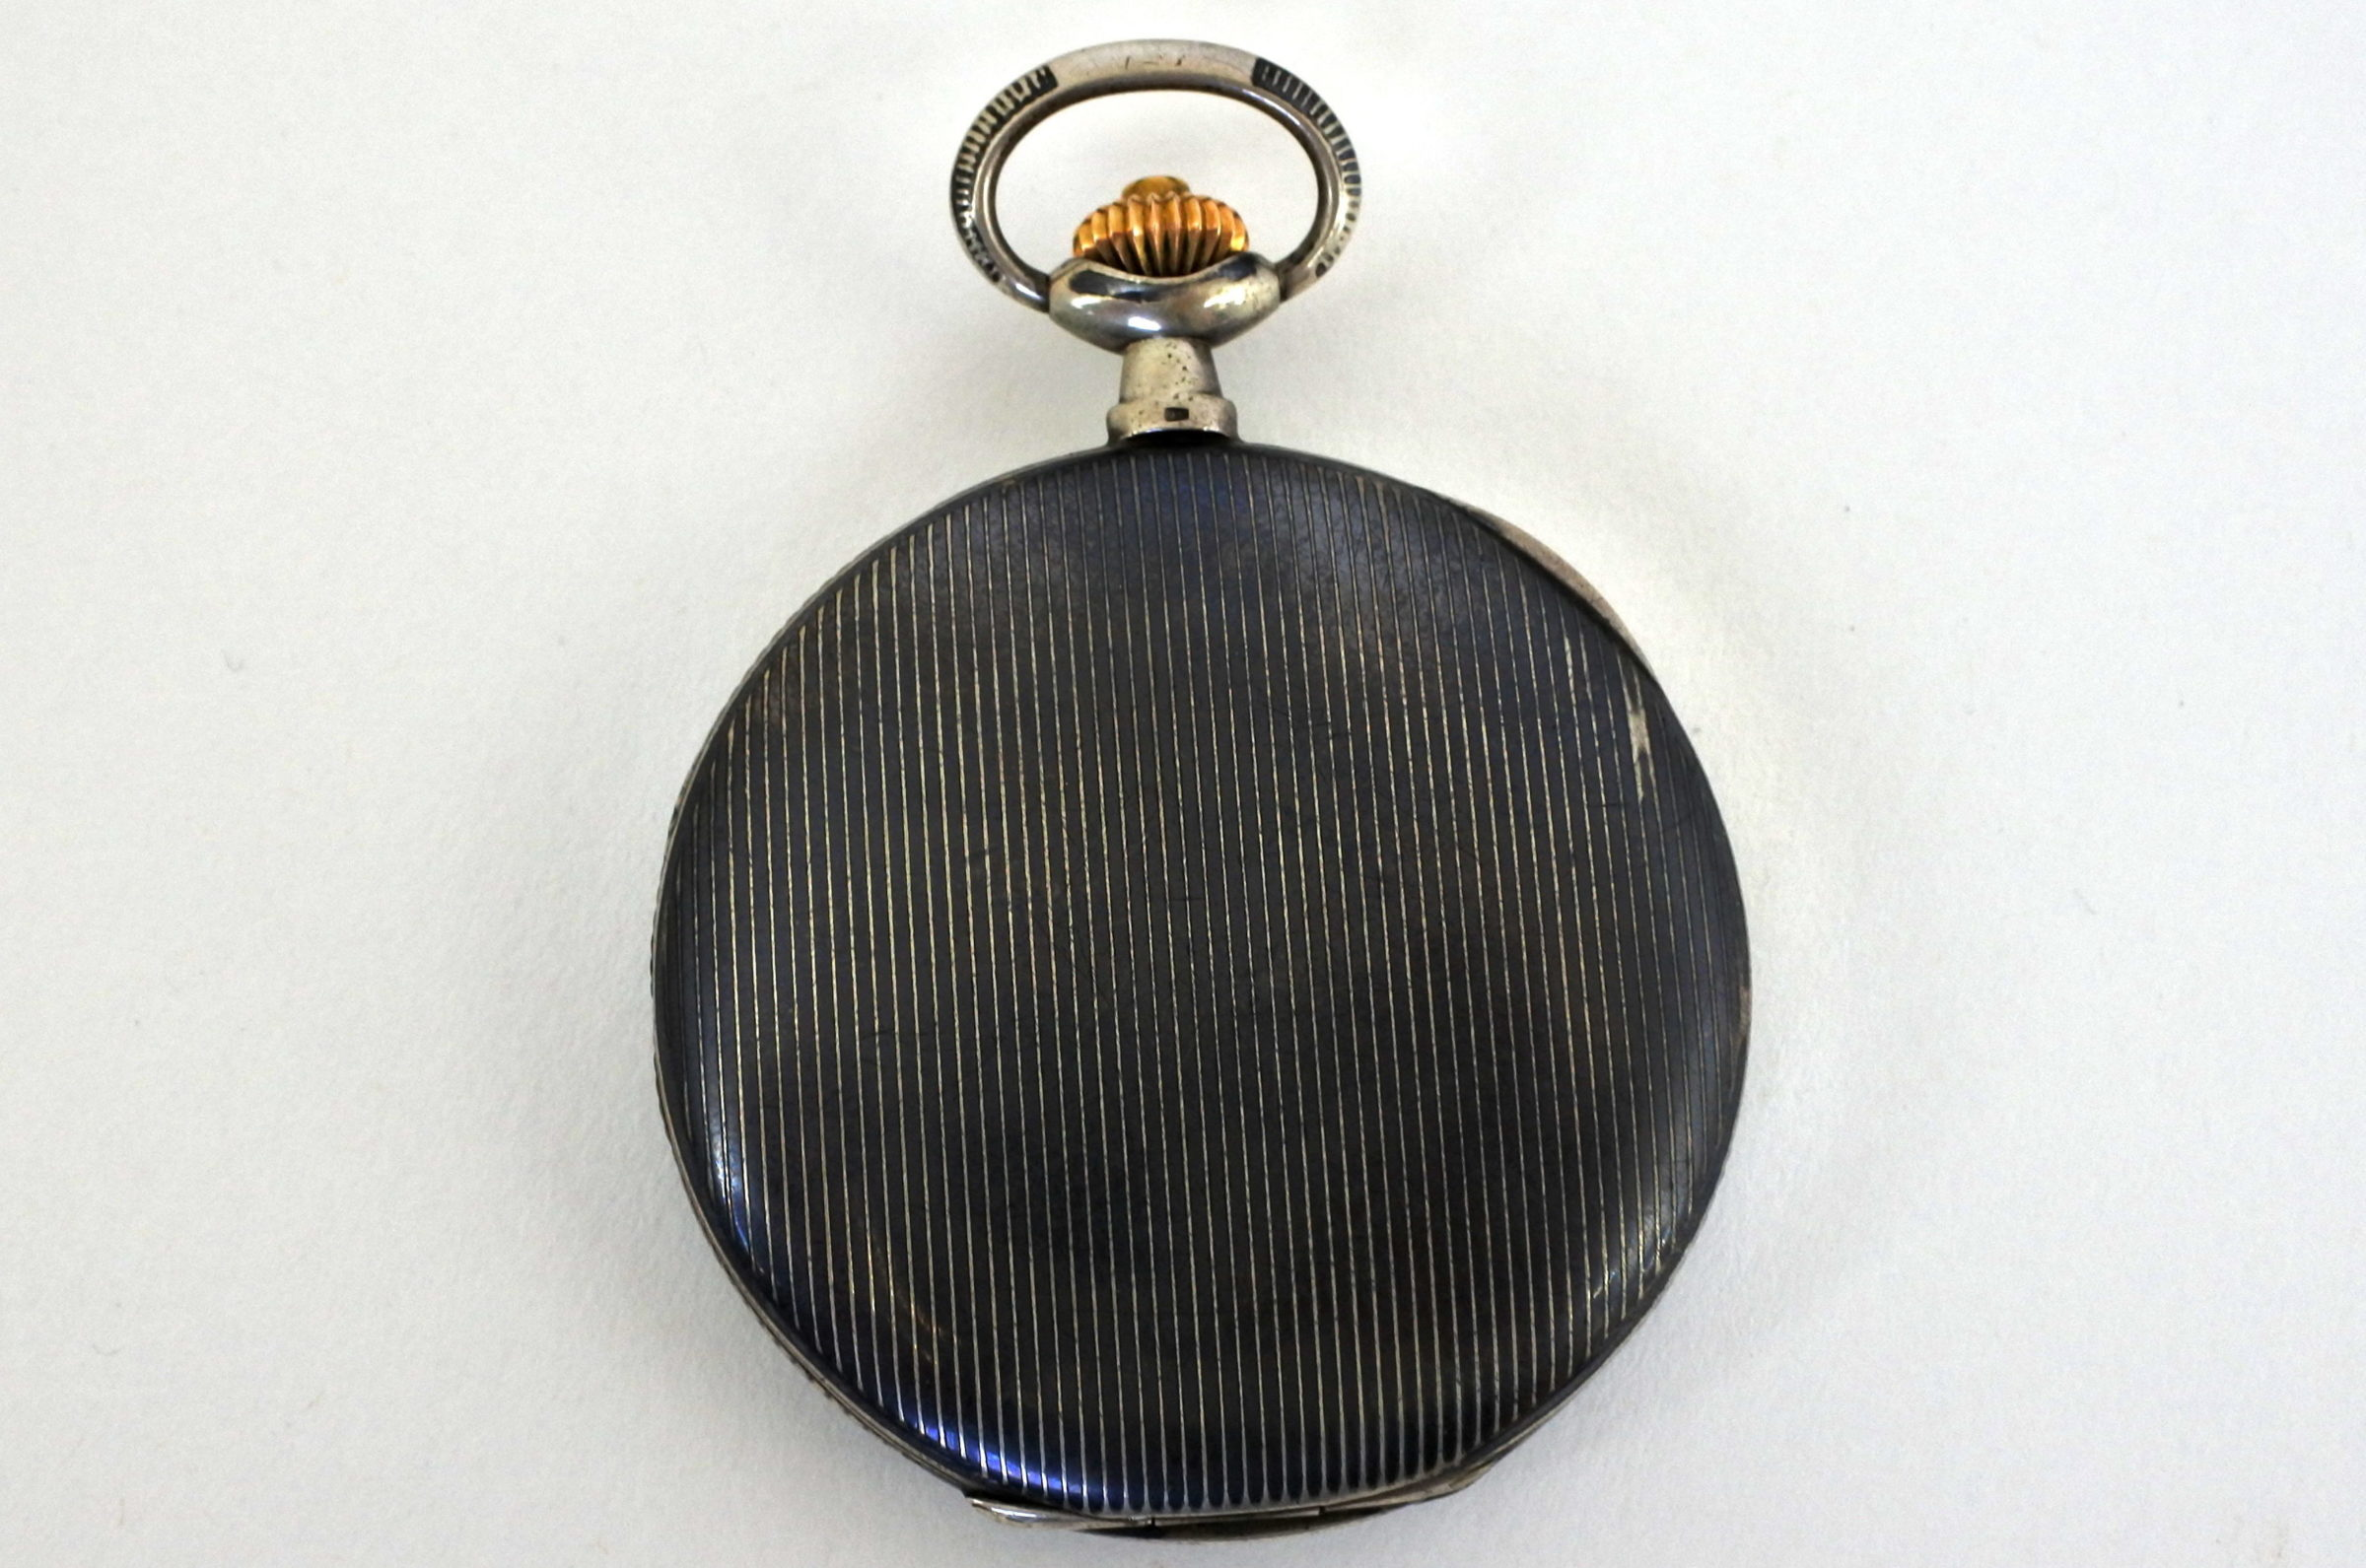 Orologio da tasca in argento e niello – Audemars Piguet Genève - 7